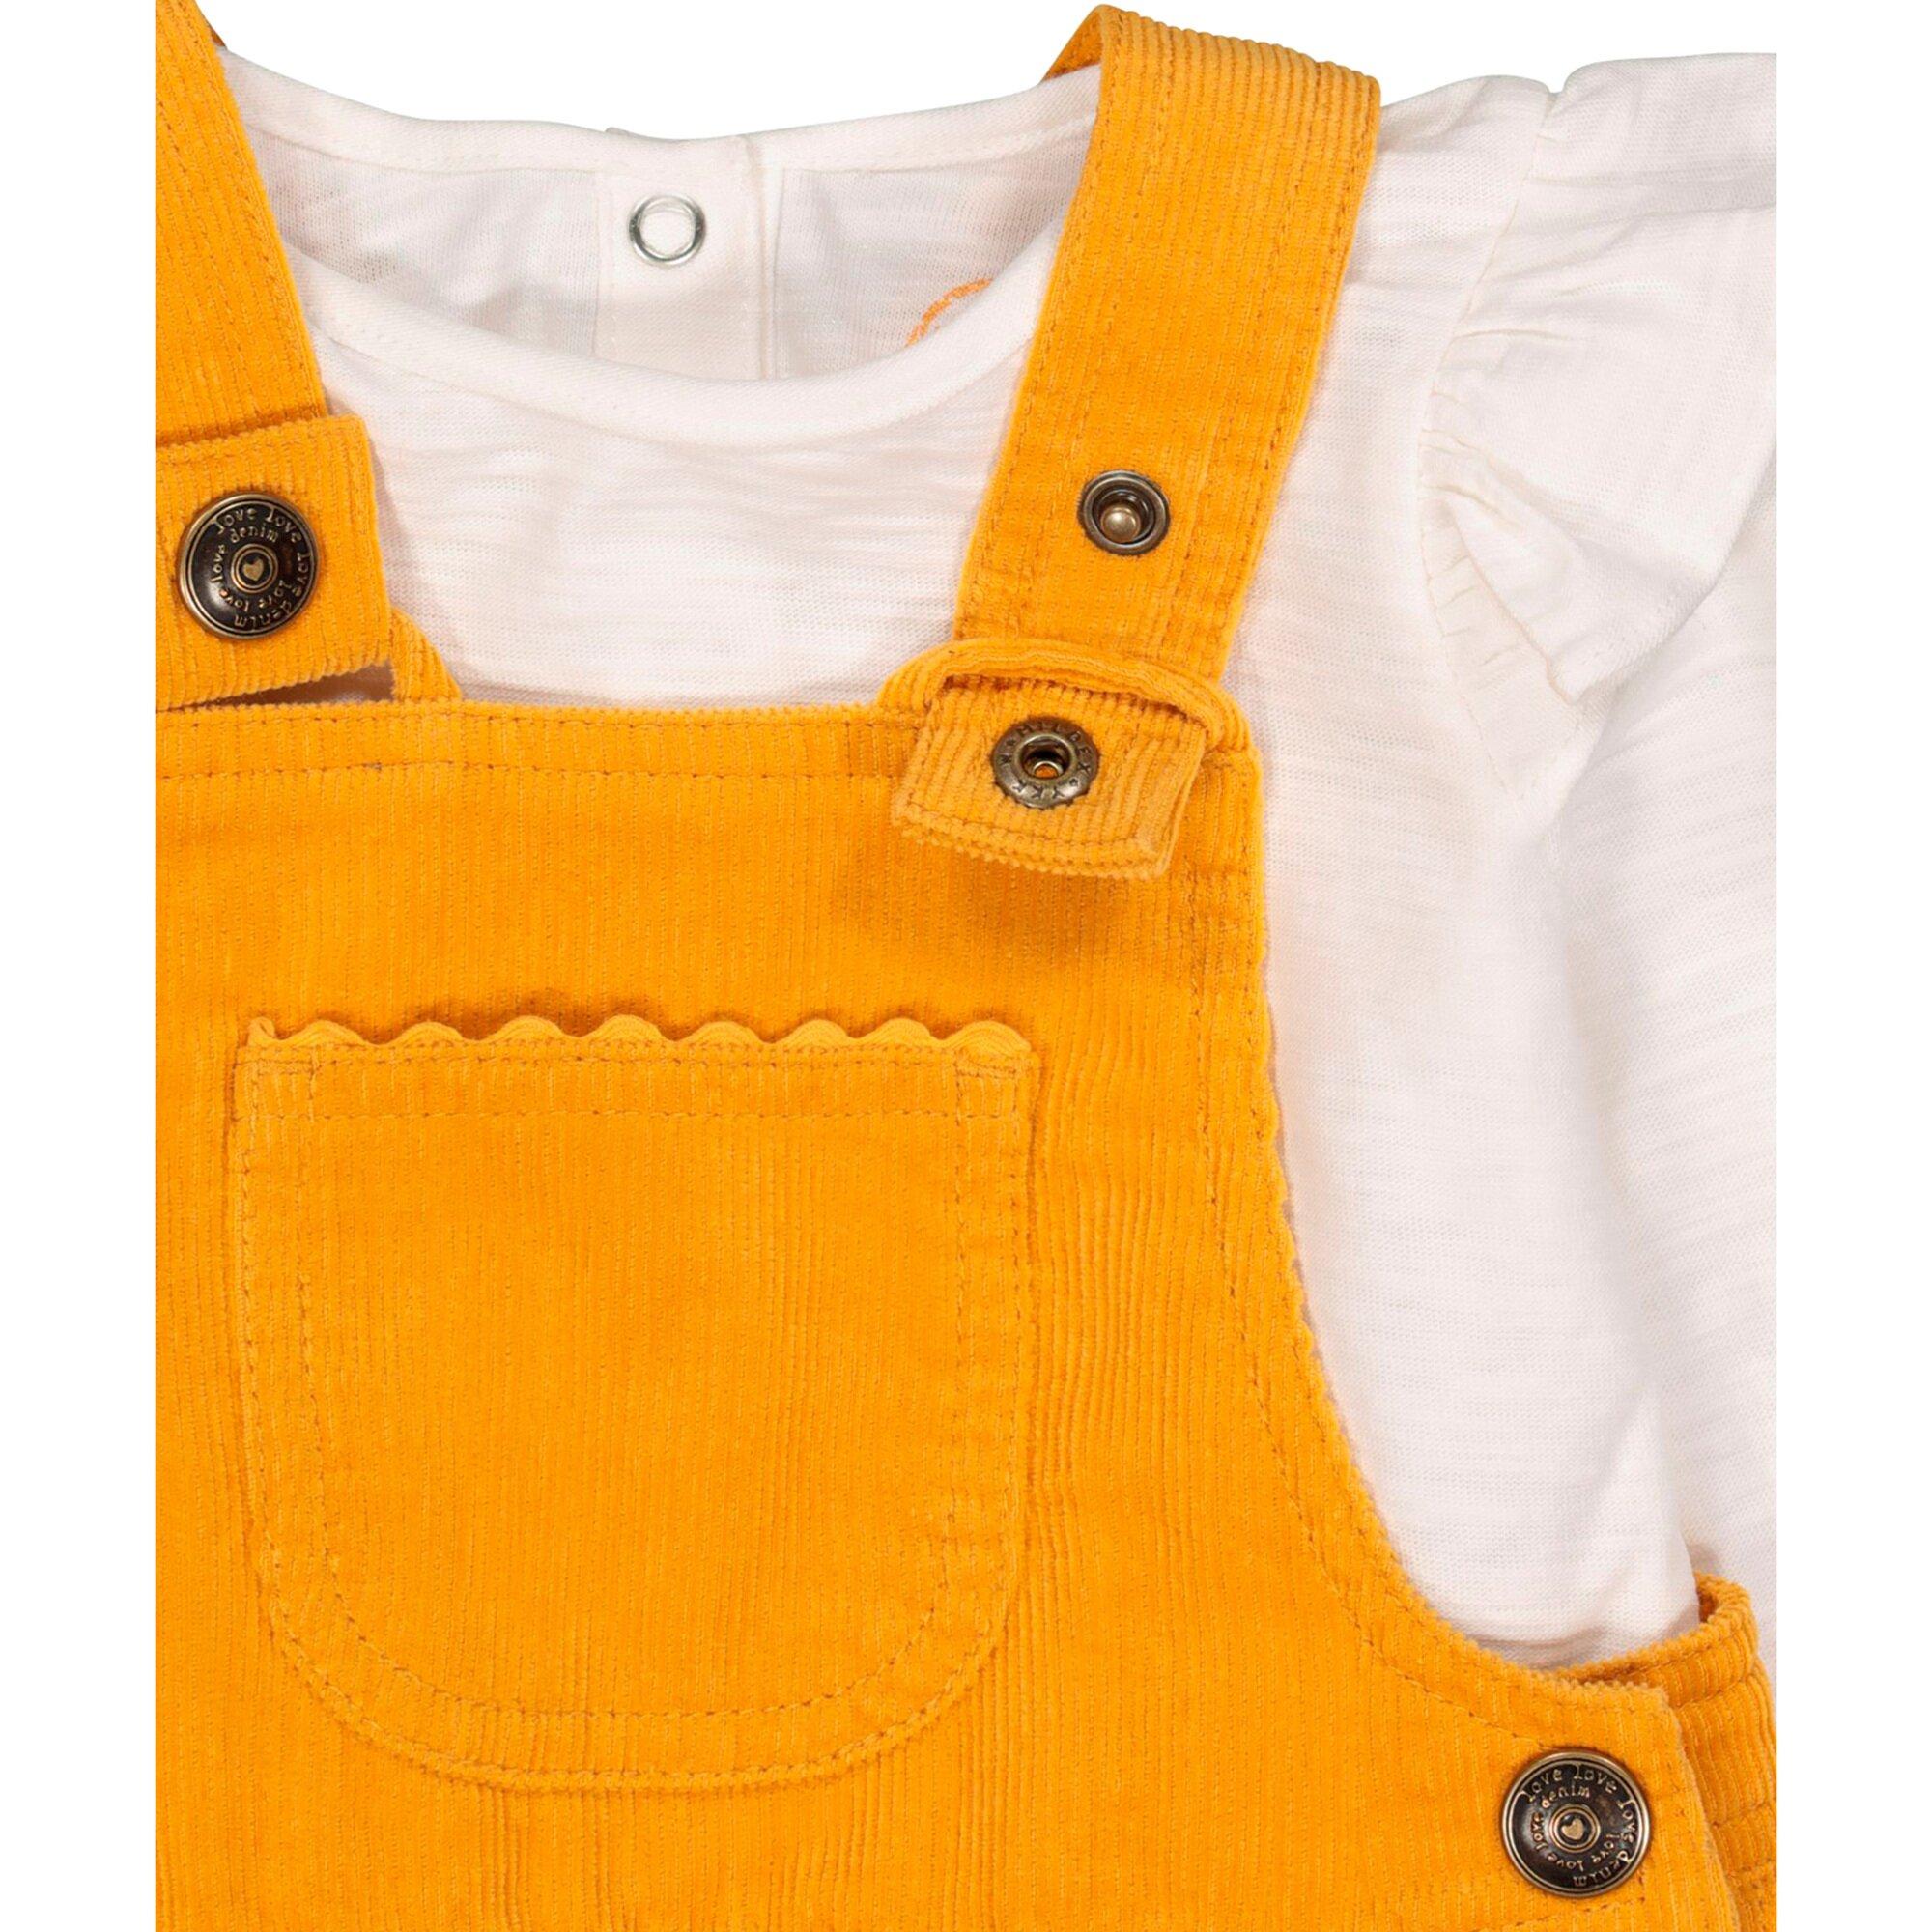 mothercare-2-tlg-set-cord-latzkleid-und-shirt-langarm